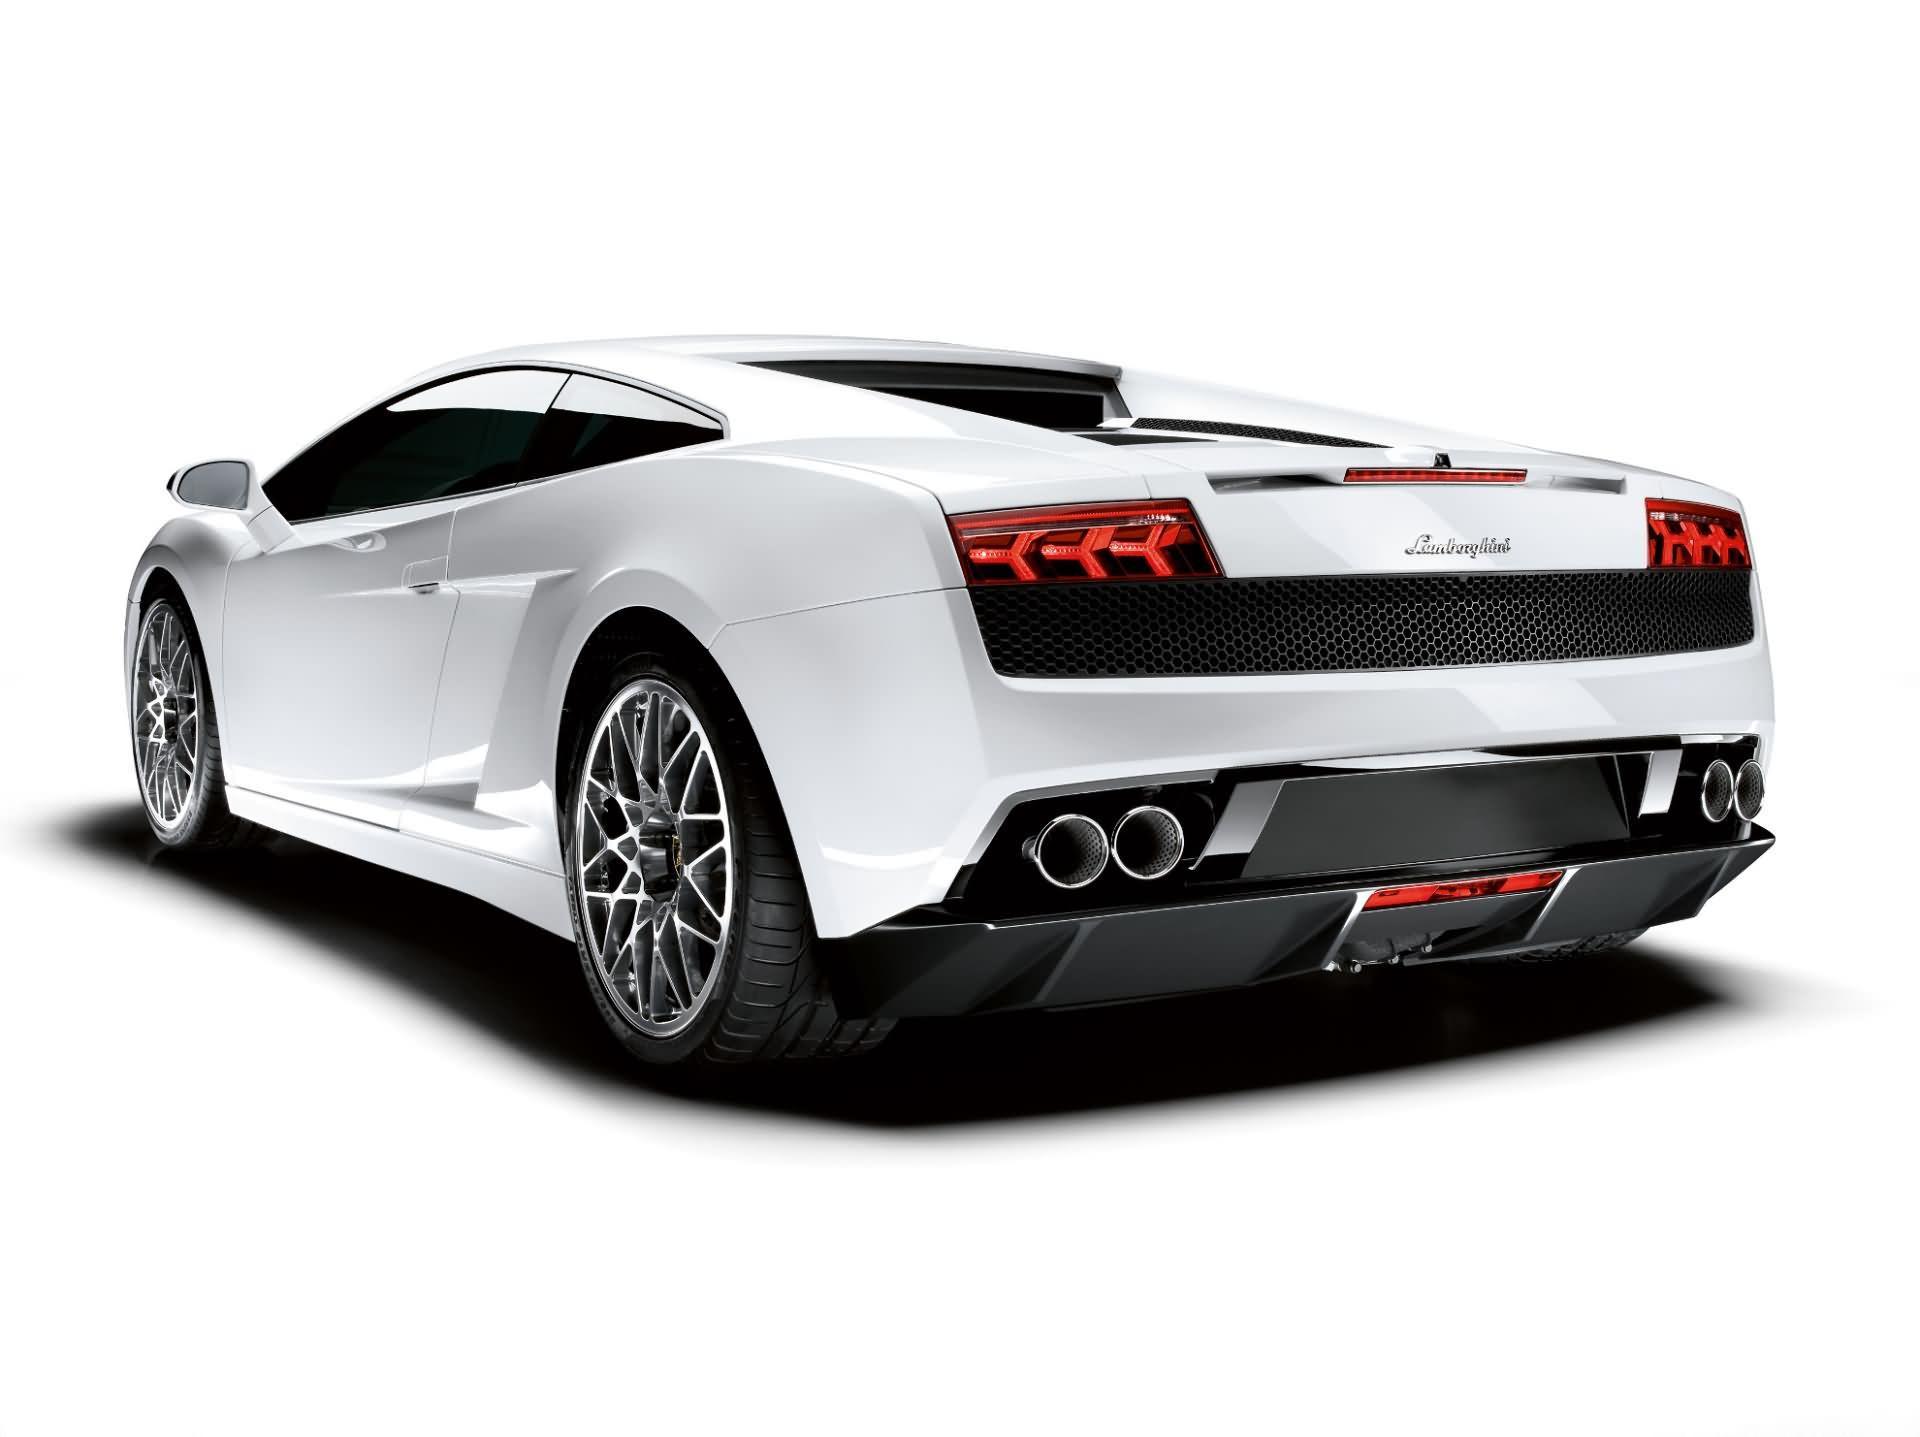 Ausfuhrliche Modellbeschreibung Uber Den Lamborghini Gallardo Lp 560 4